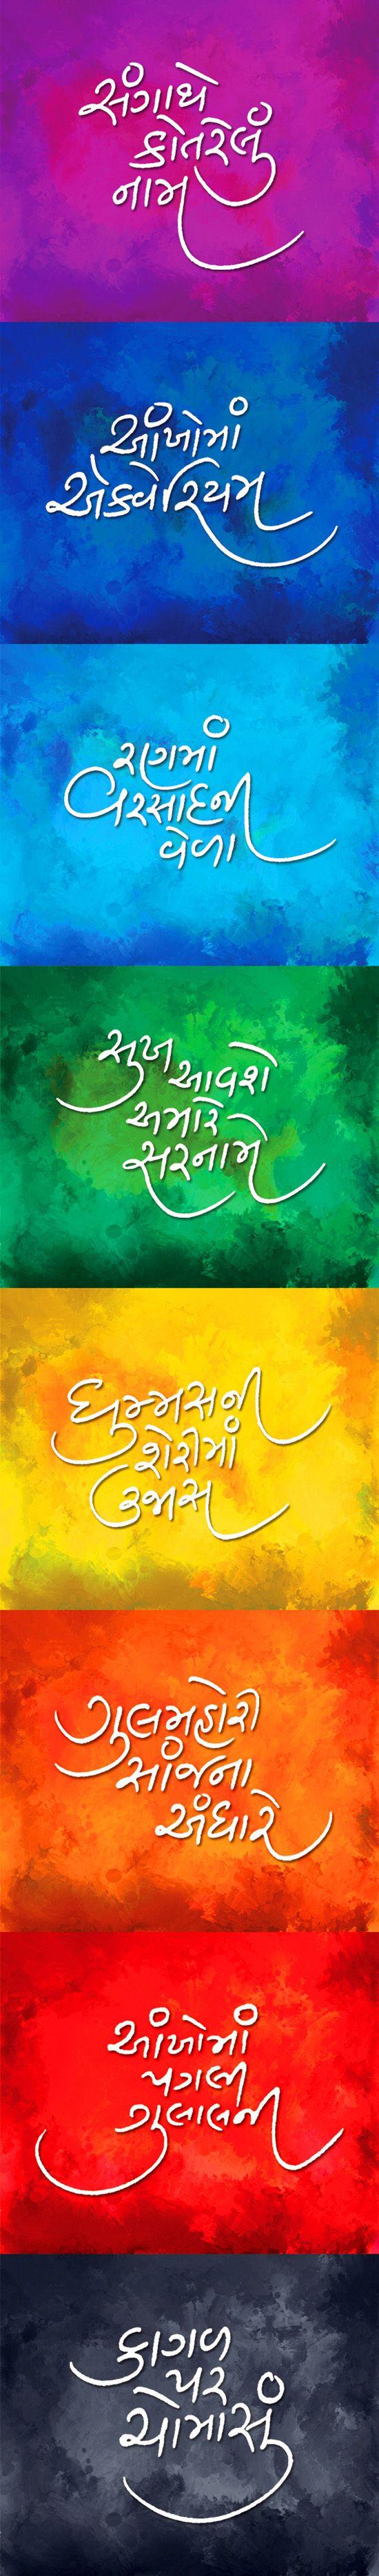 Beautiful Gujarati Typo  Names of Poems | Typo & Quotes